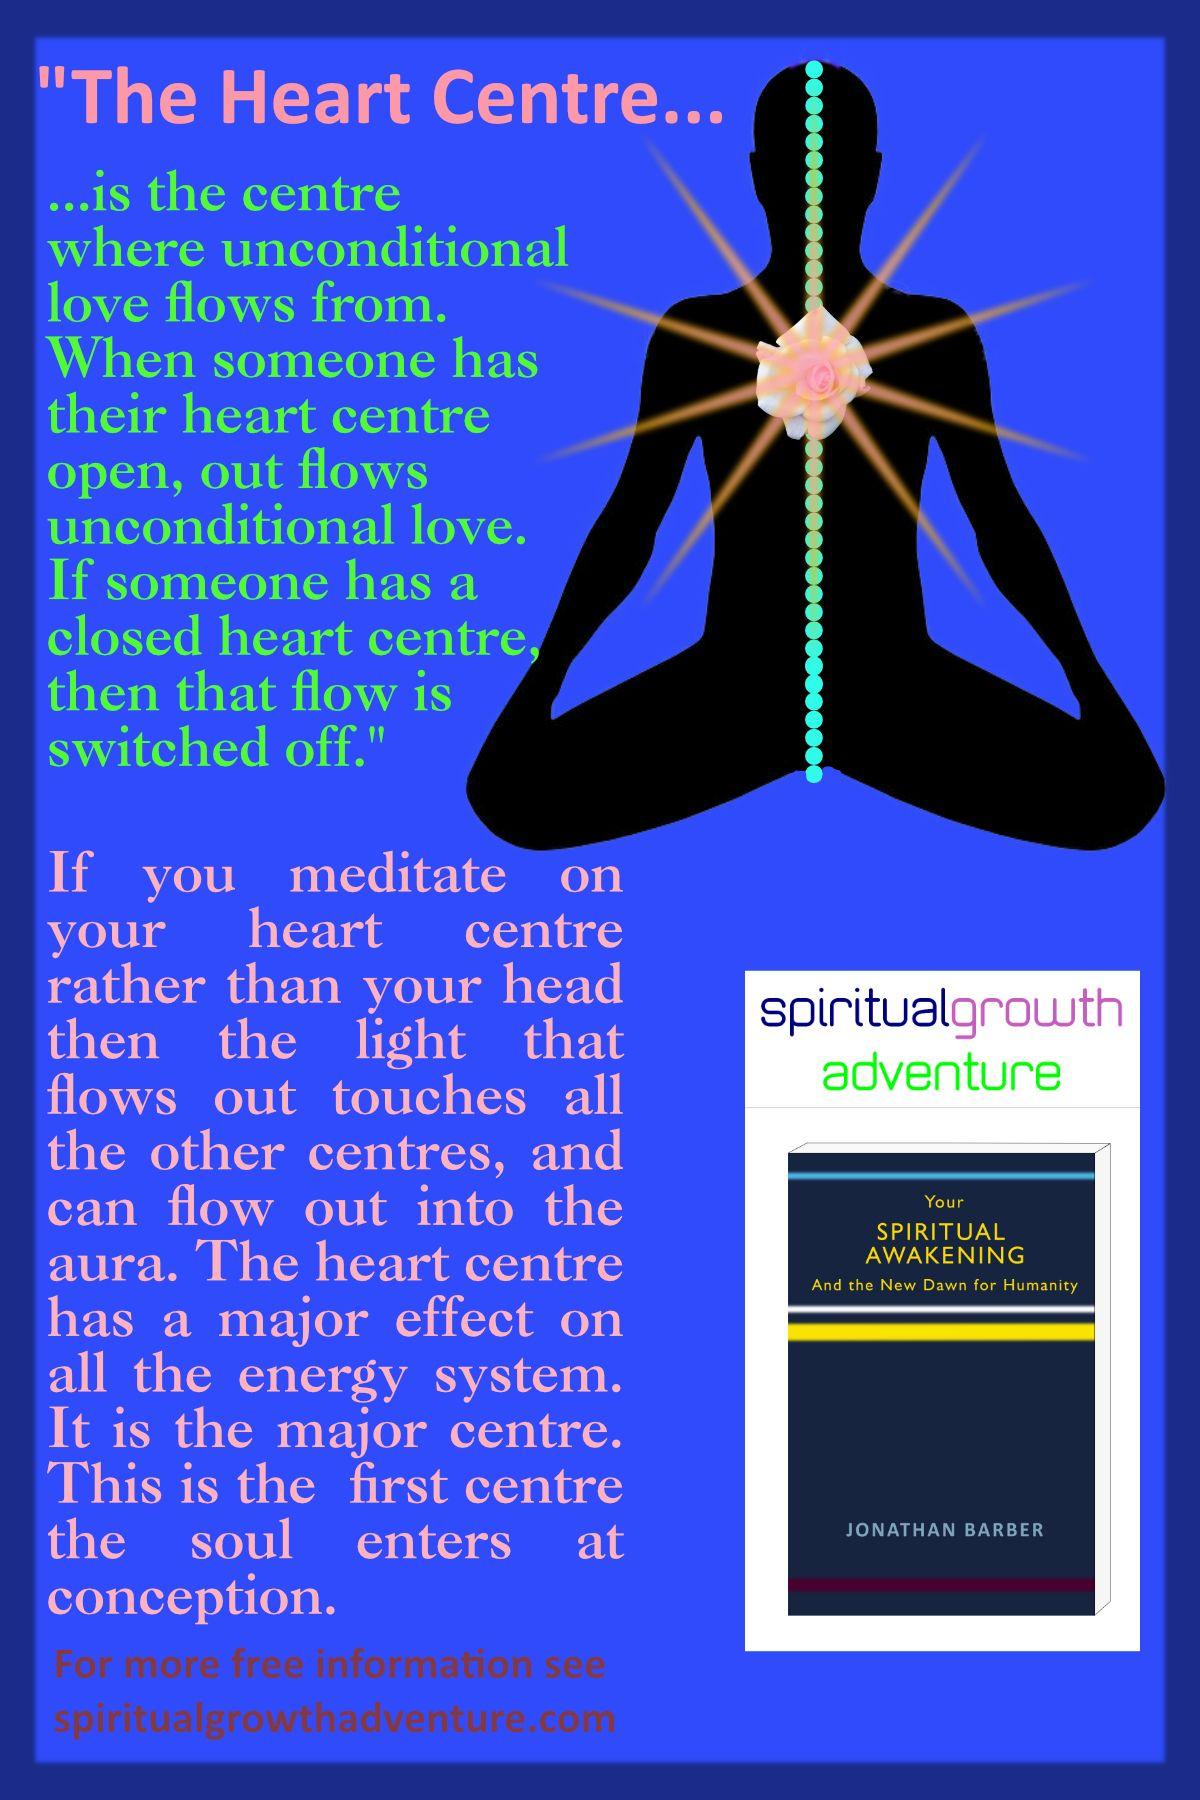 The Heart Centre and Meditation  Meditation on the heart